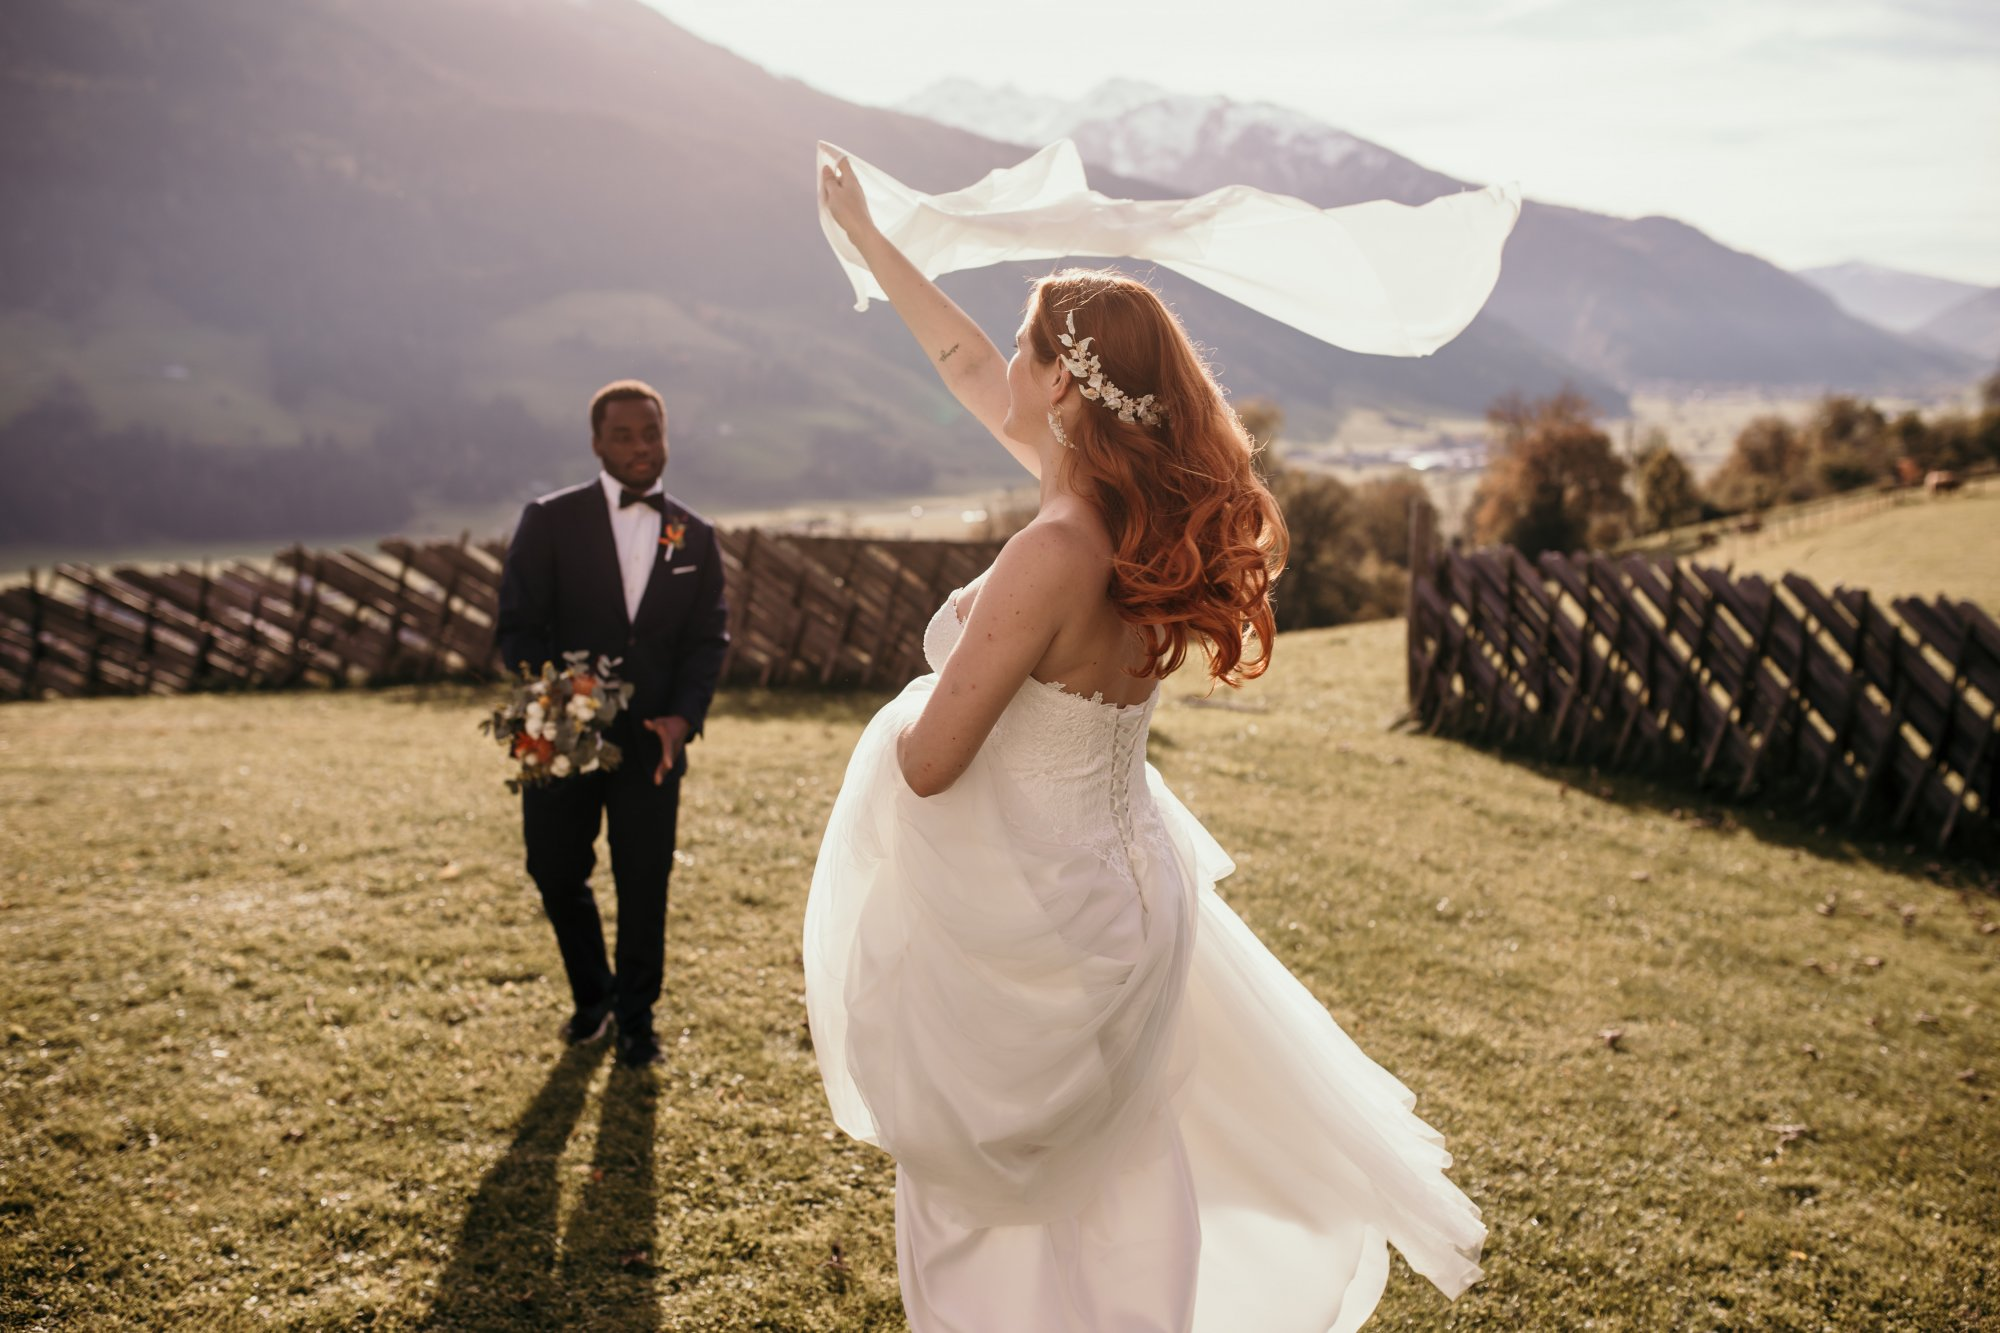 Intimate Wedding Austria - Micro Wedding Austria - Stressfree Weddings by SandraM